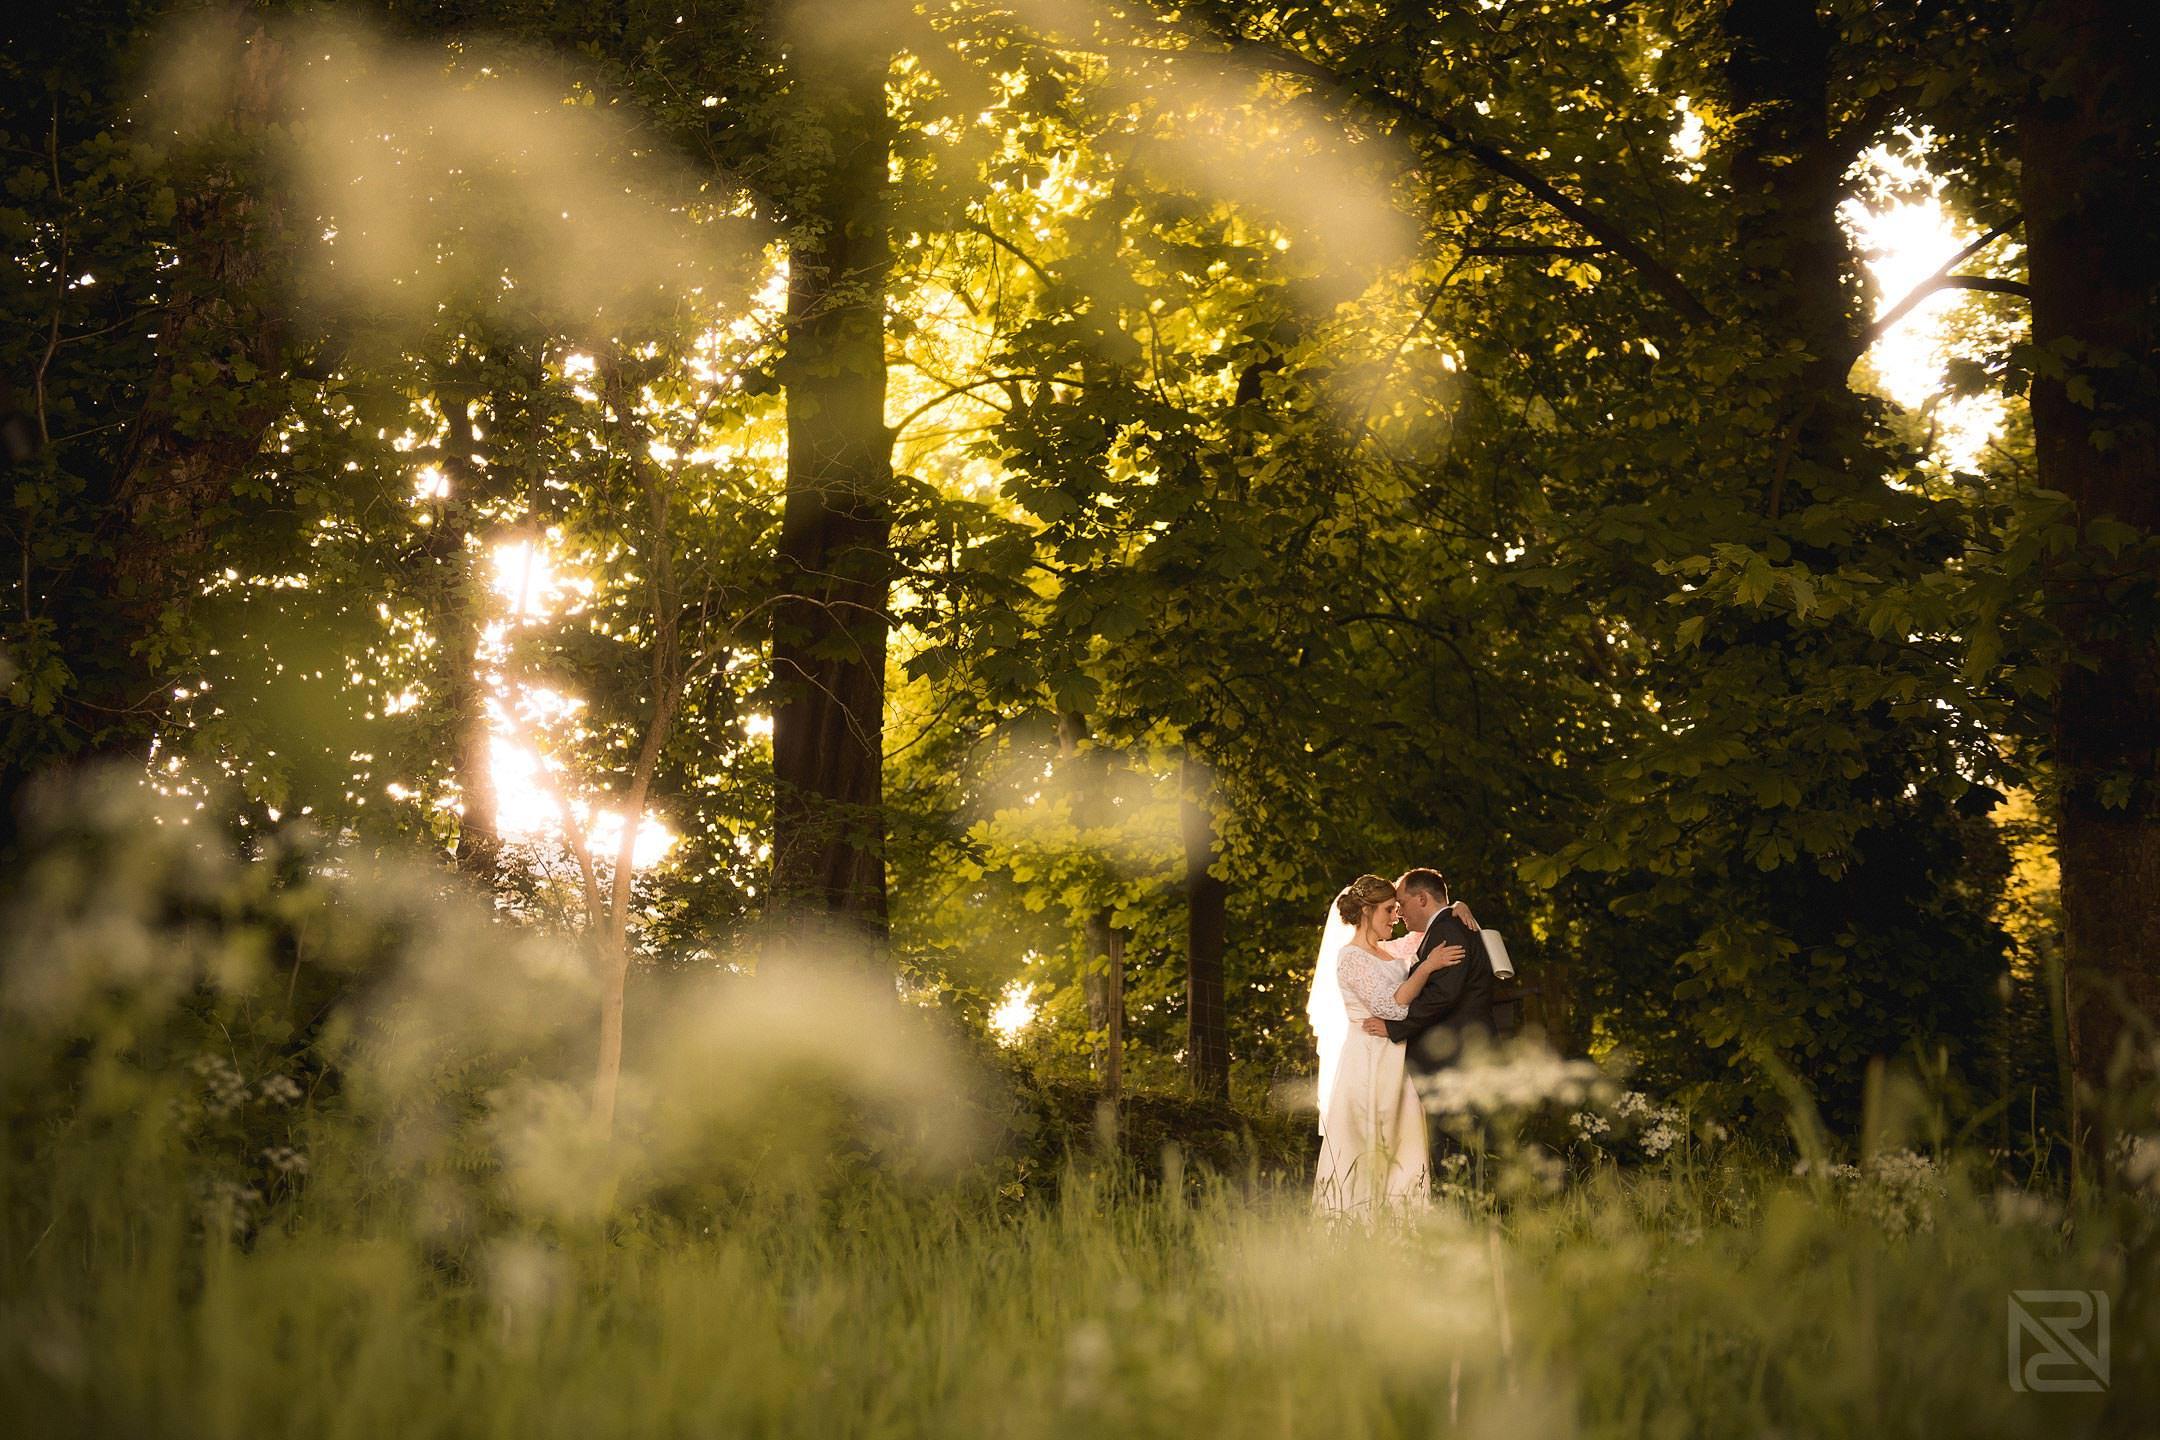 best-wedding-photographs-2015-101